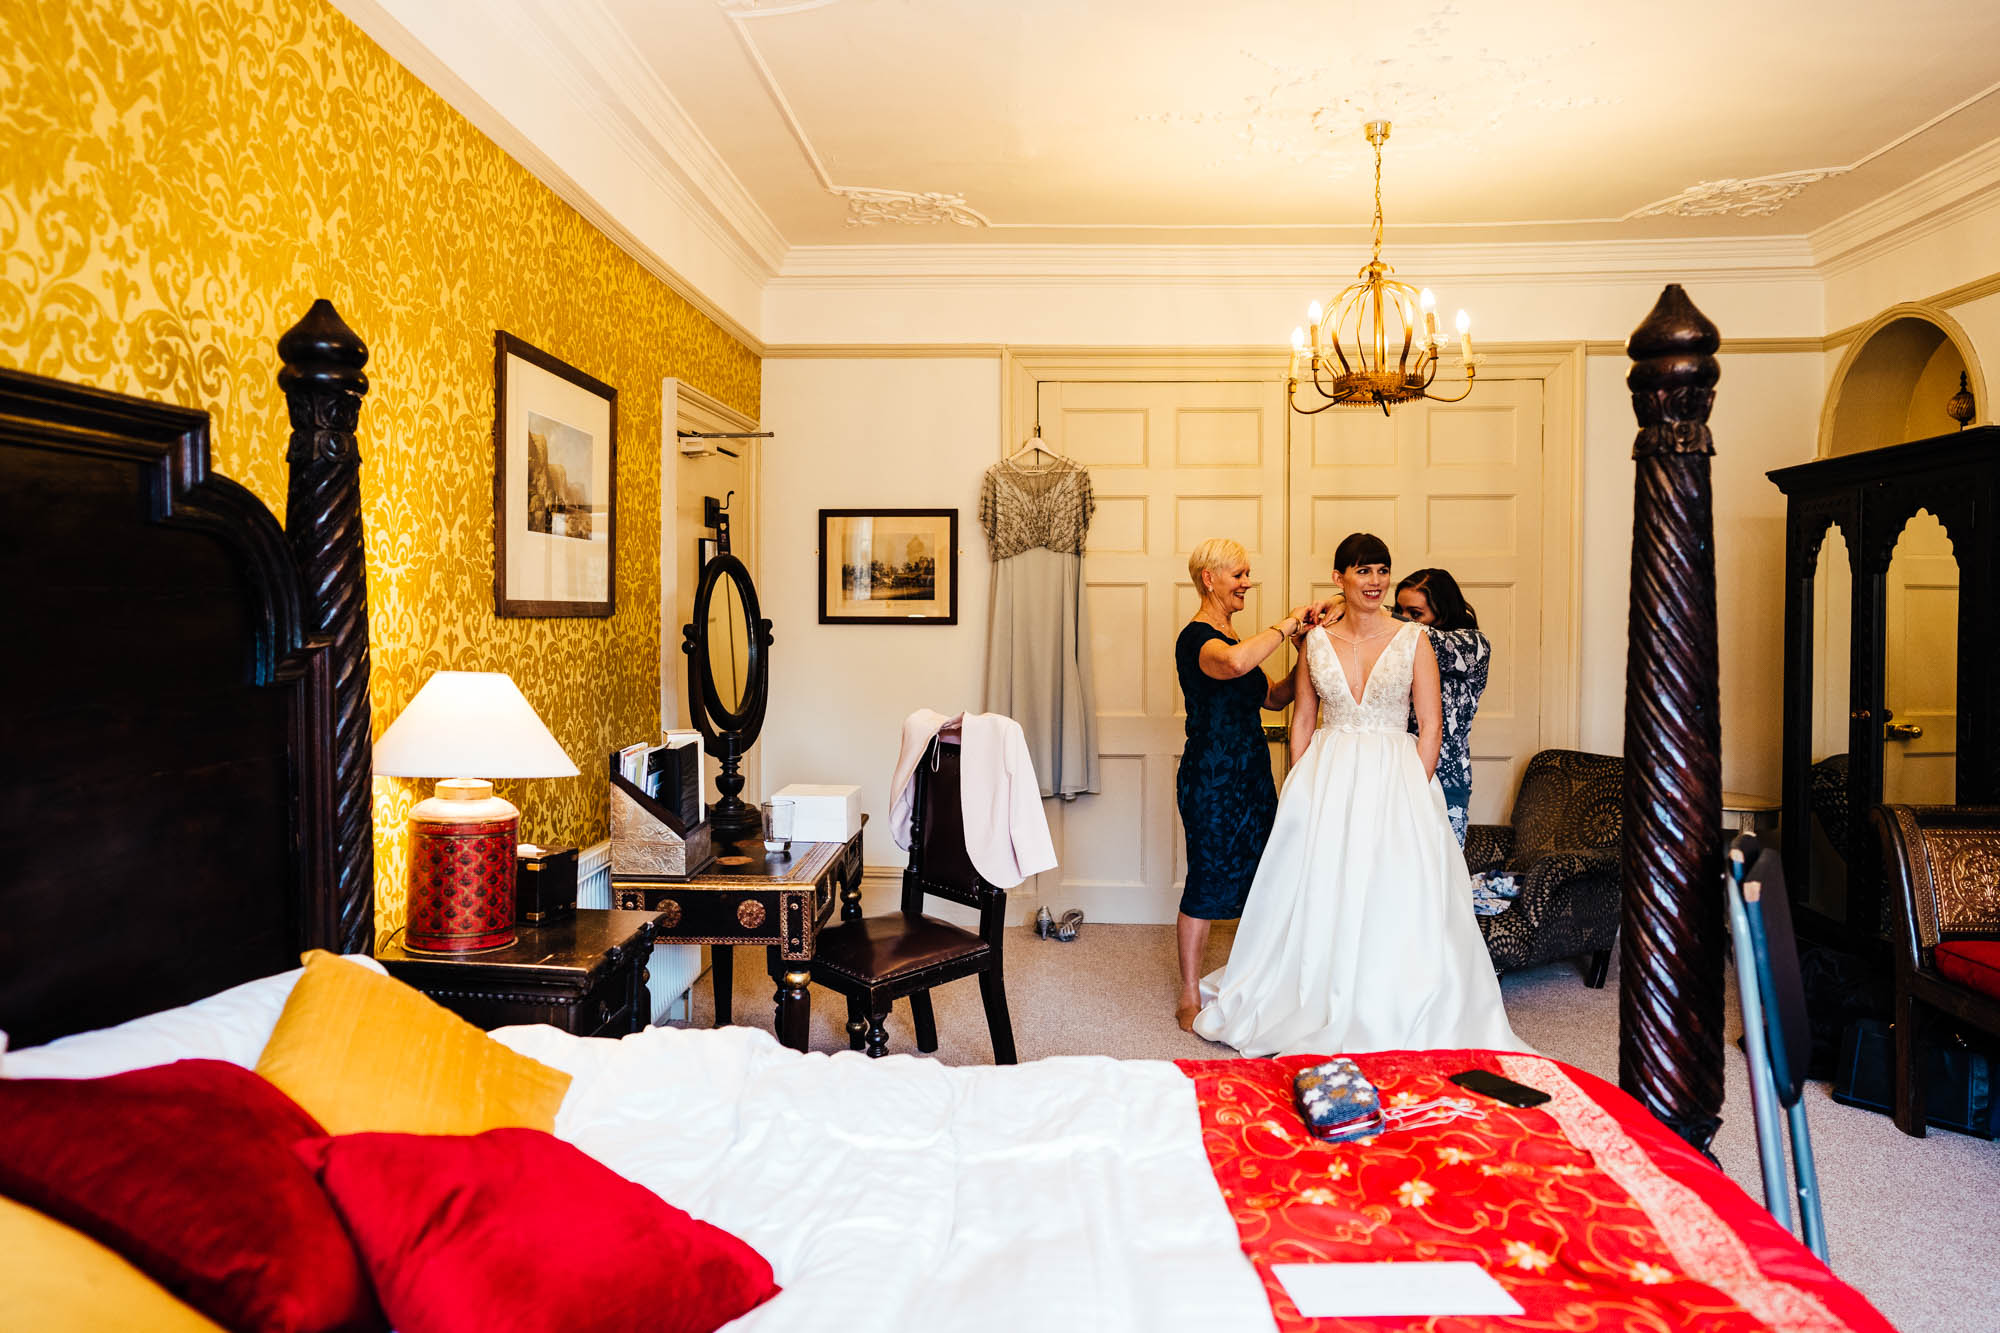 william-cecil-stamford-wedding-12